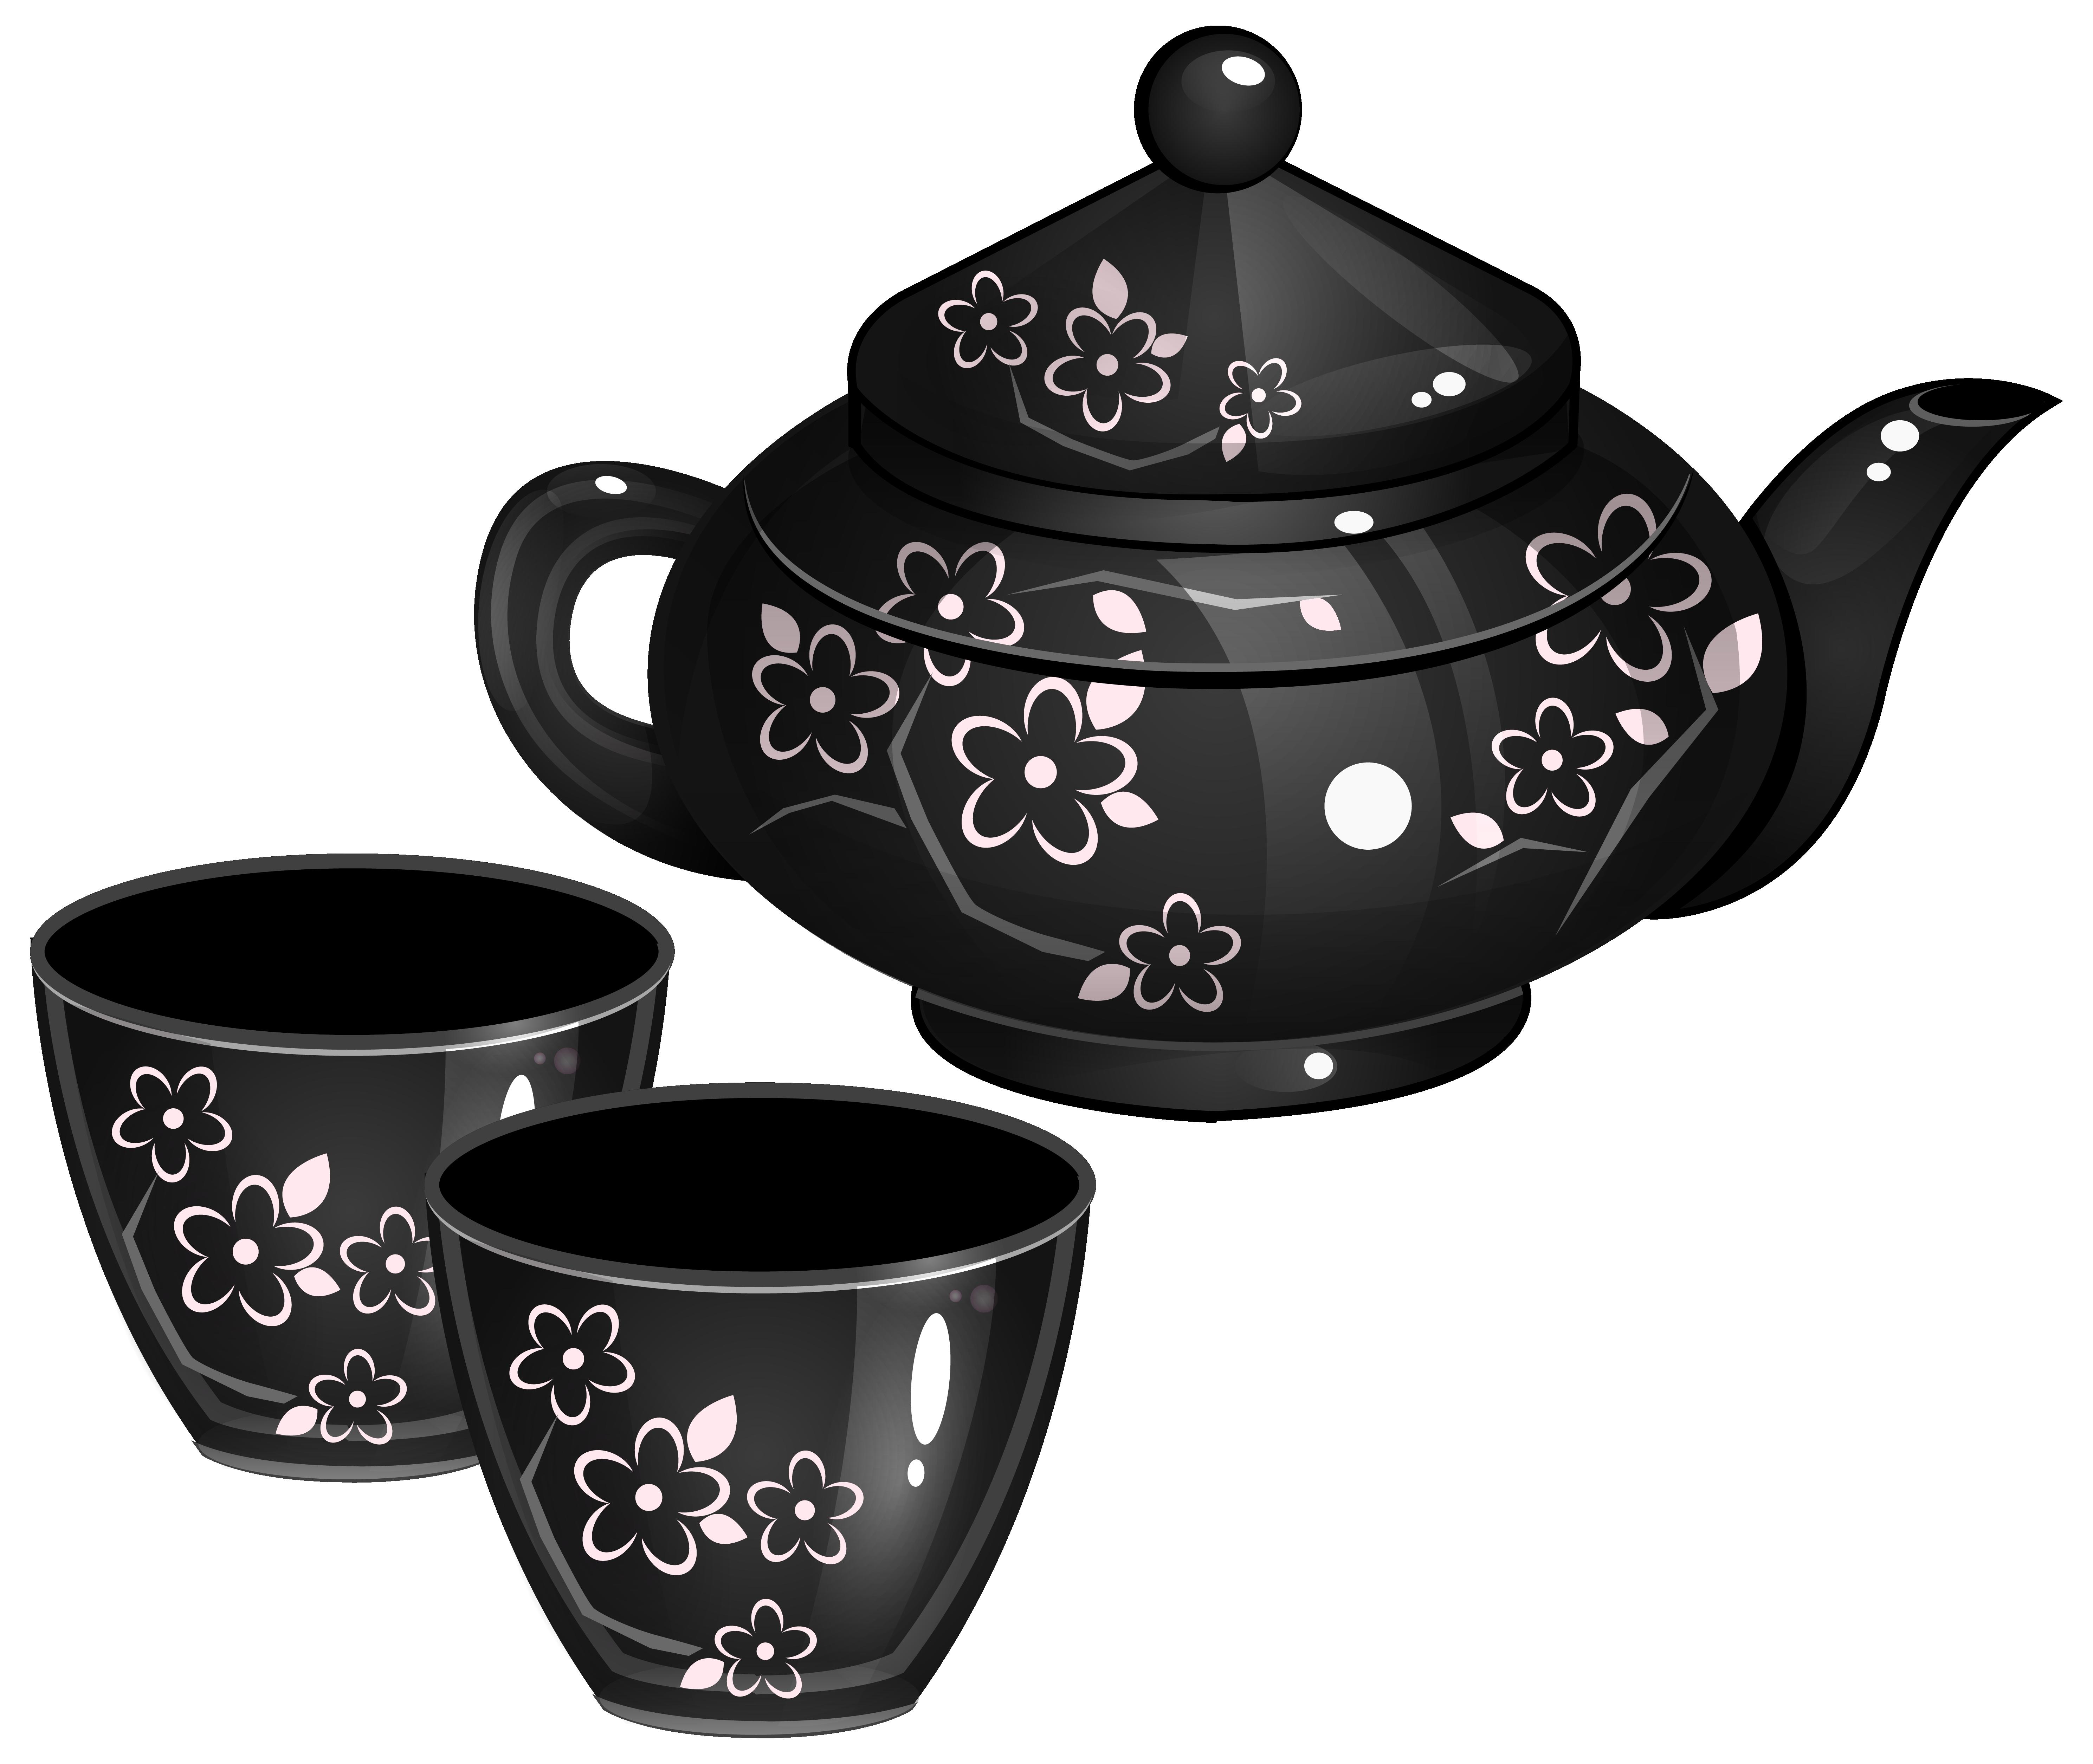 Tea Set PNG Clipart Image.